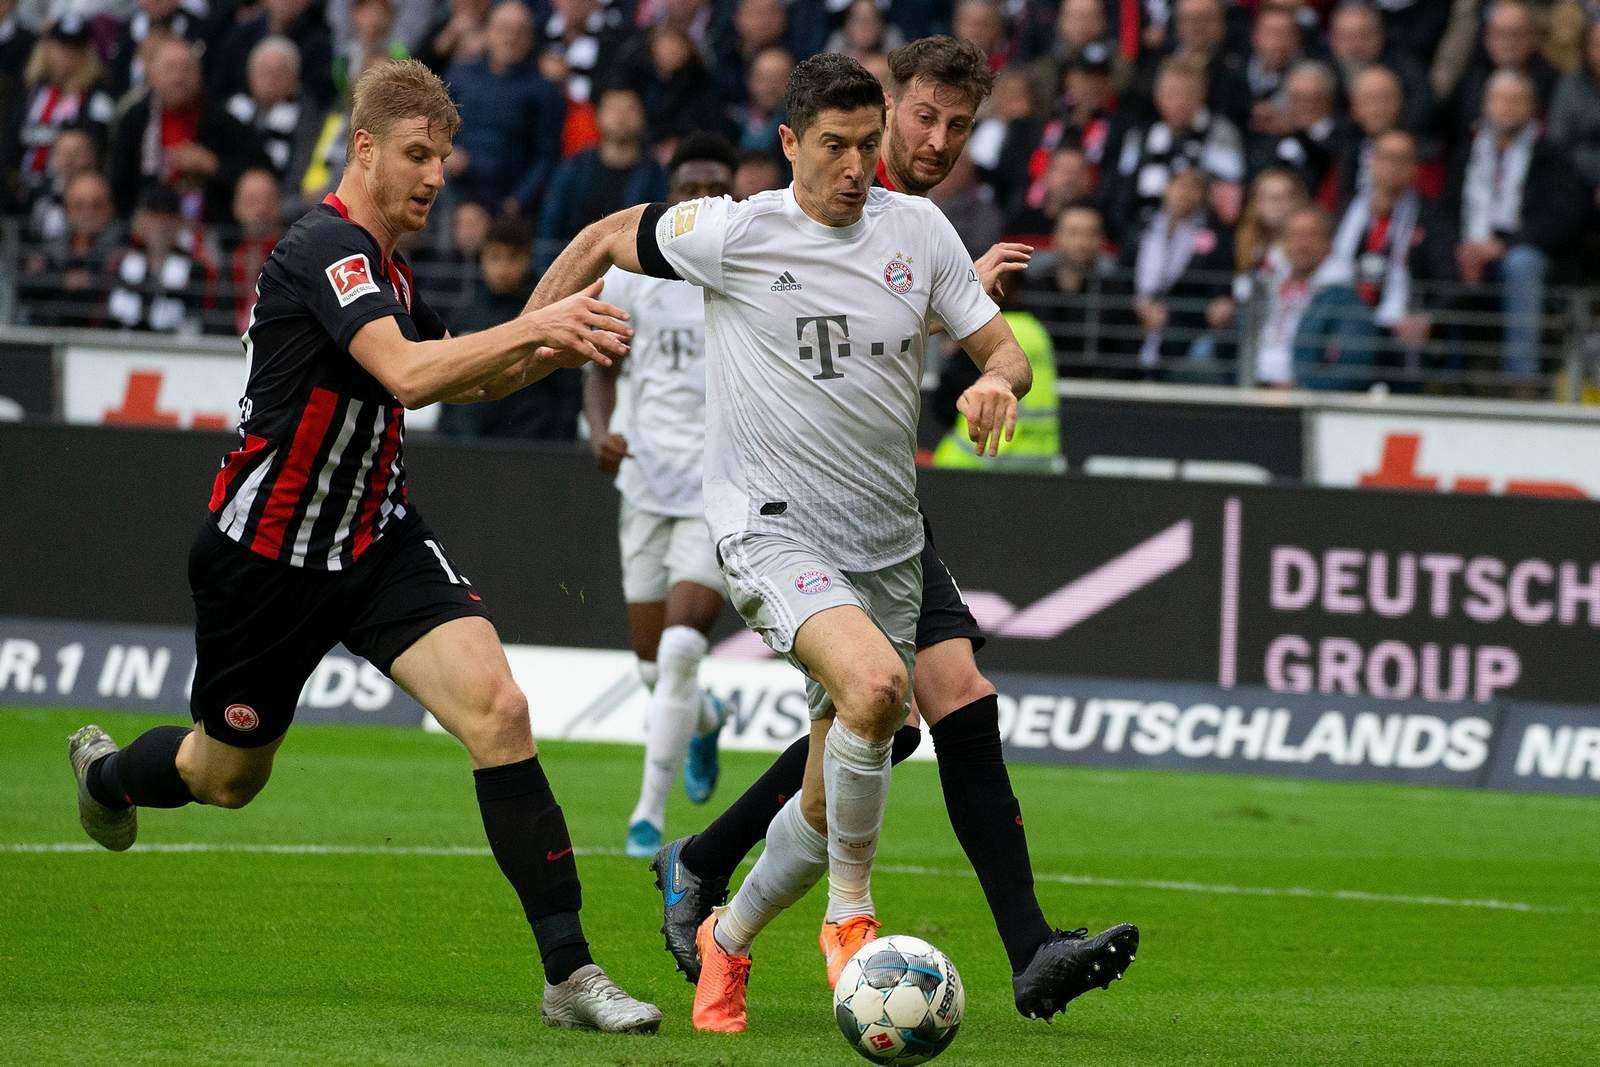 Martin Hinterwegger gegen Robert Lewandowski. Jetzt auf Bayern gegen Frankfurt wetten!